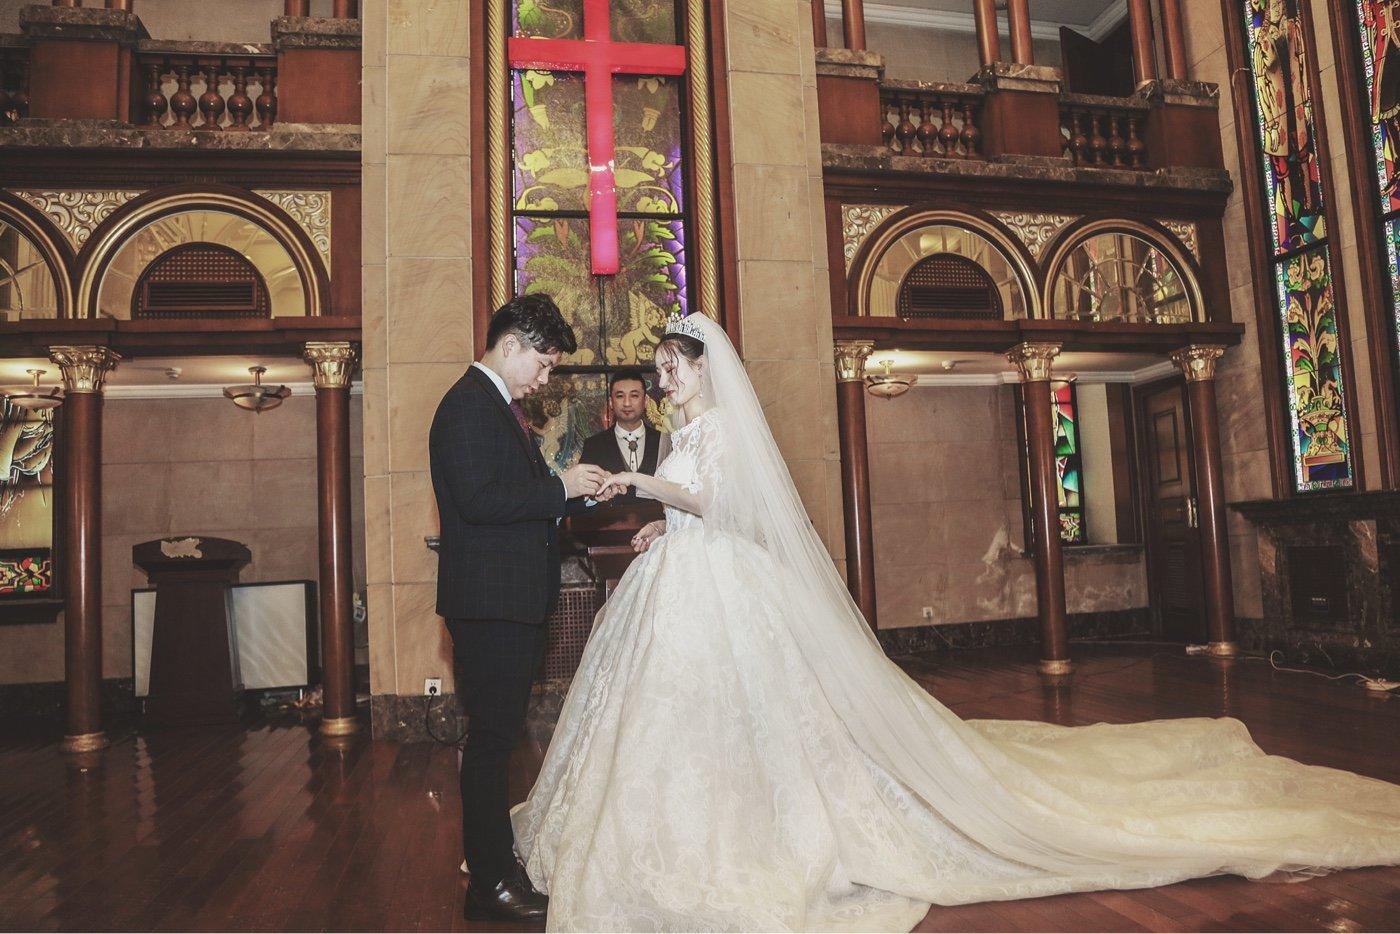 「Fantasy Wedding」&明珠教堂⛪4